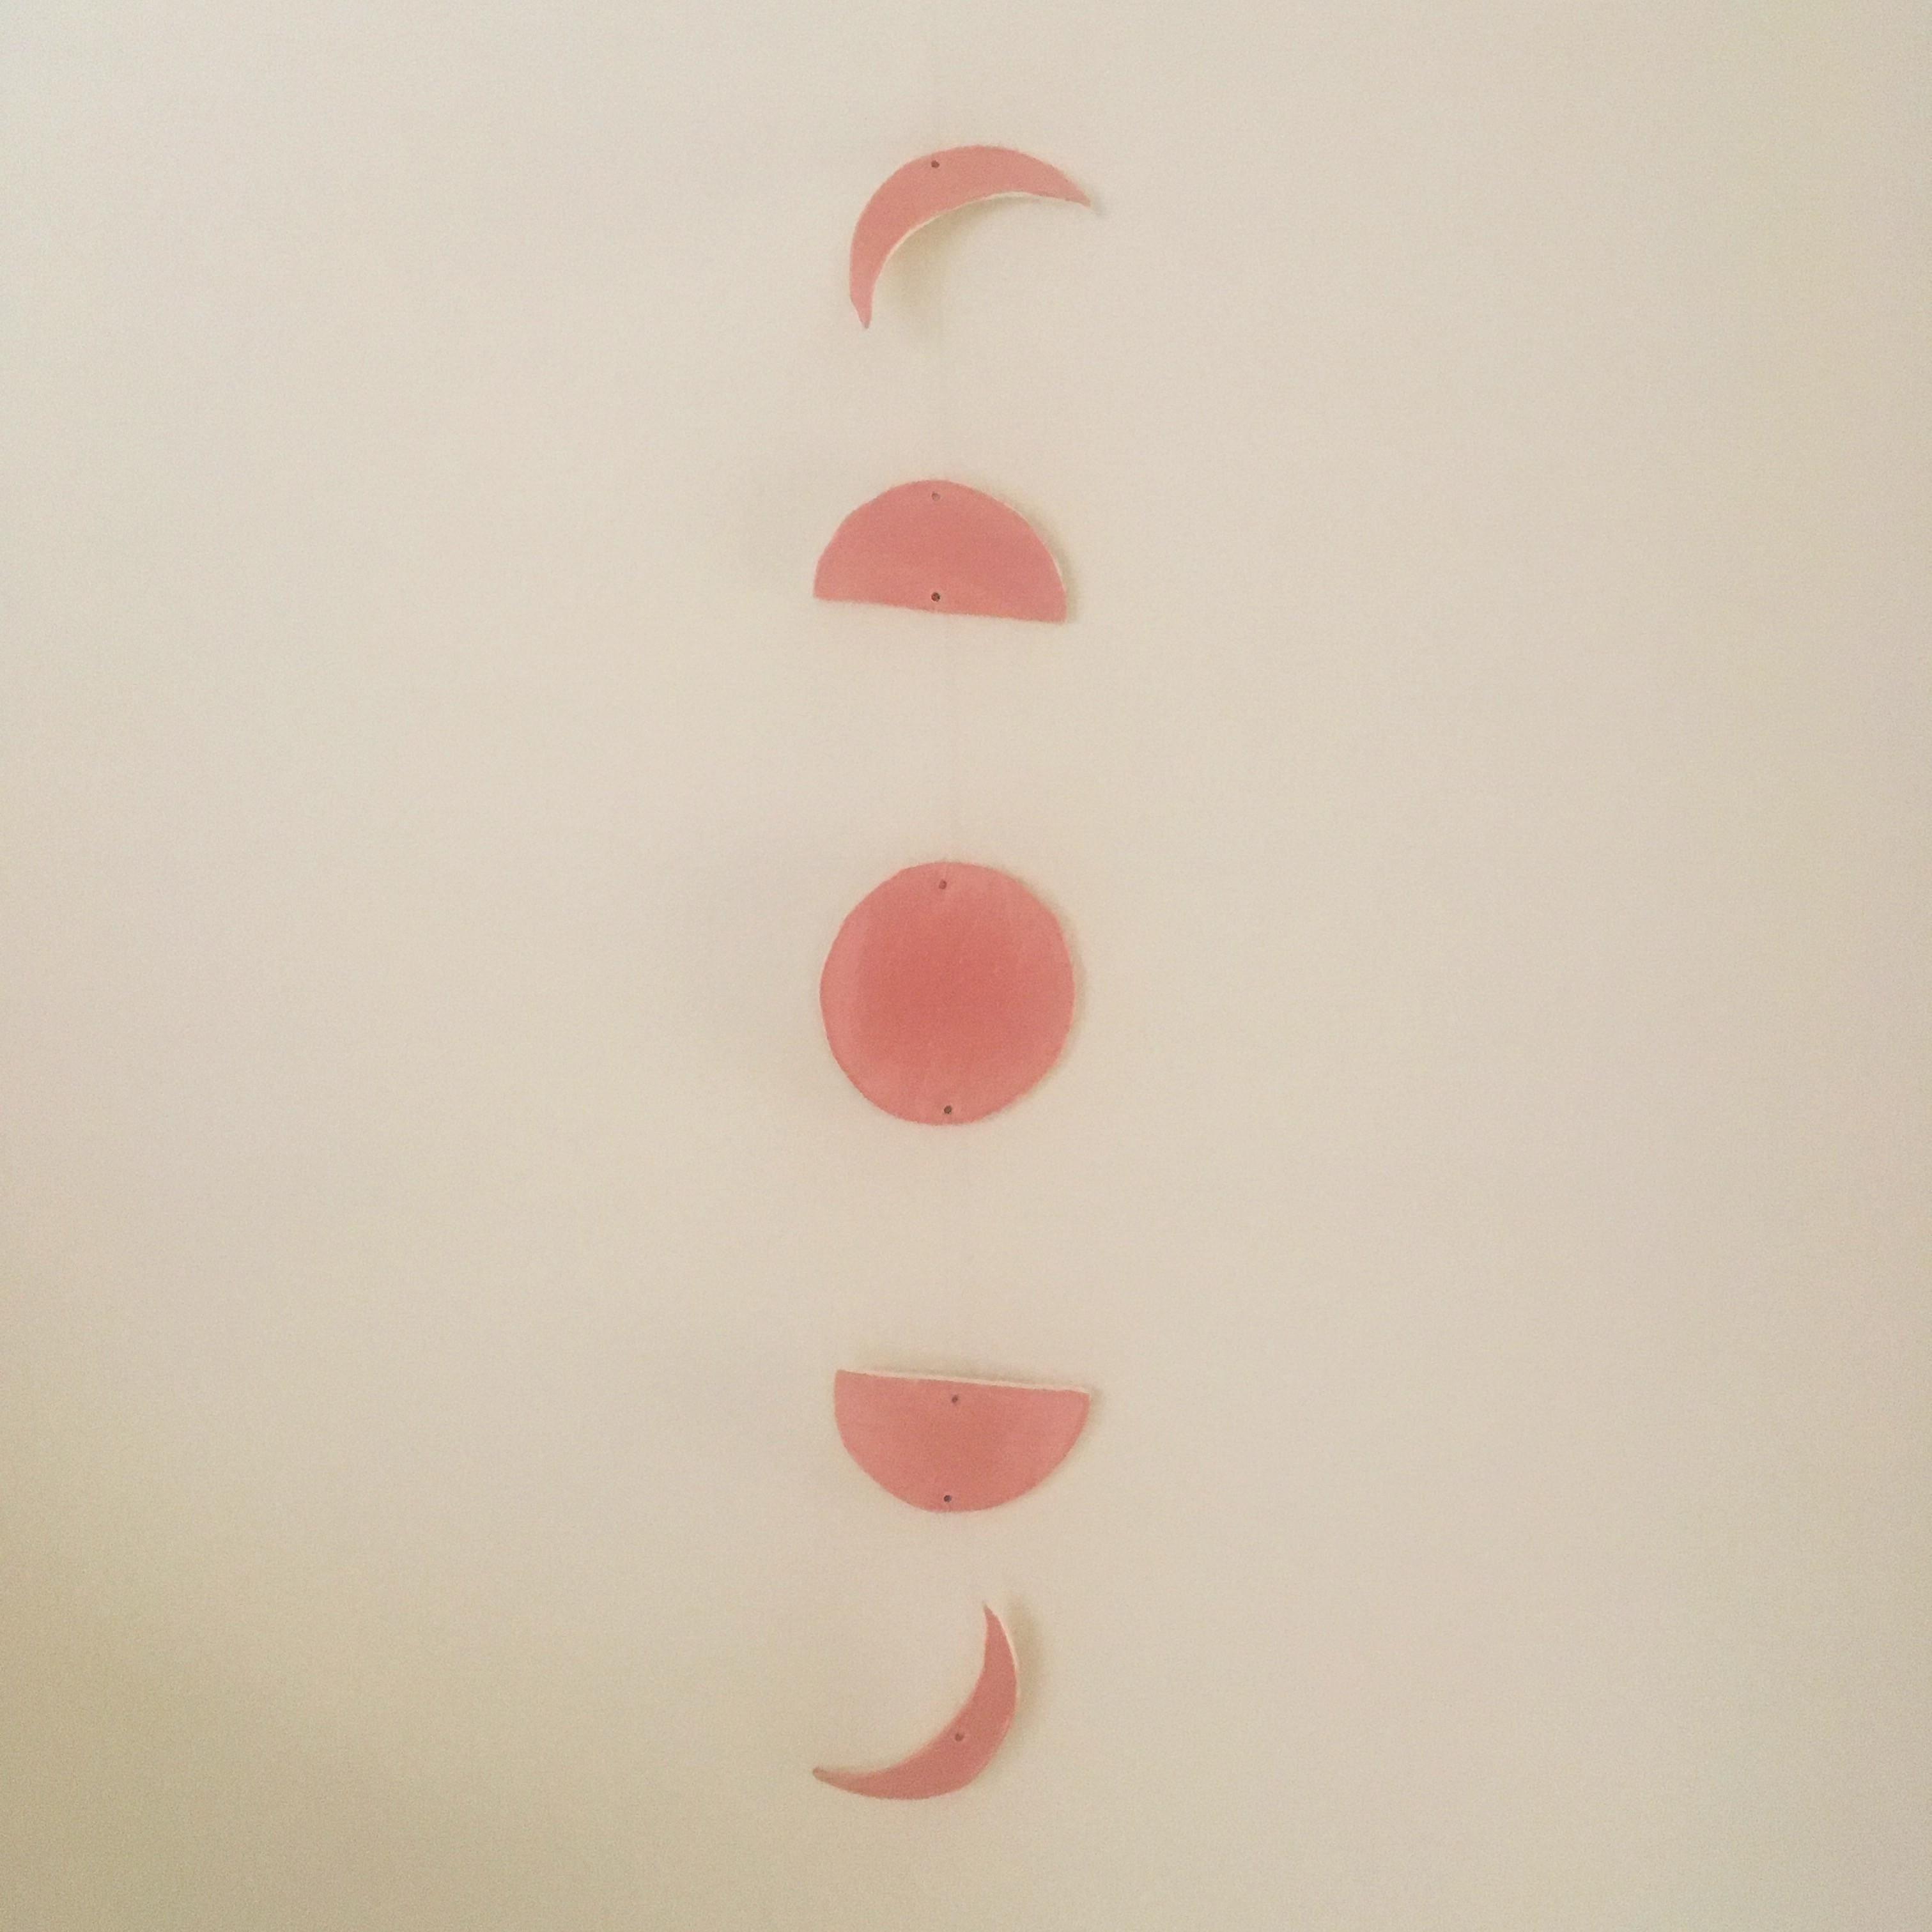 MOON CYCLE MASSAGE